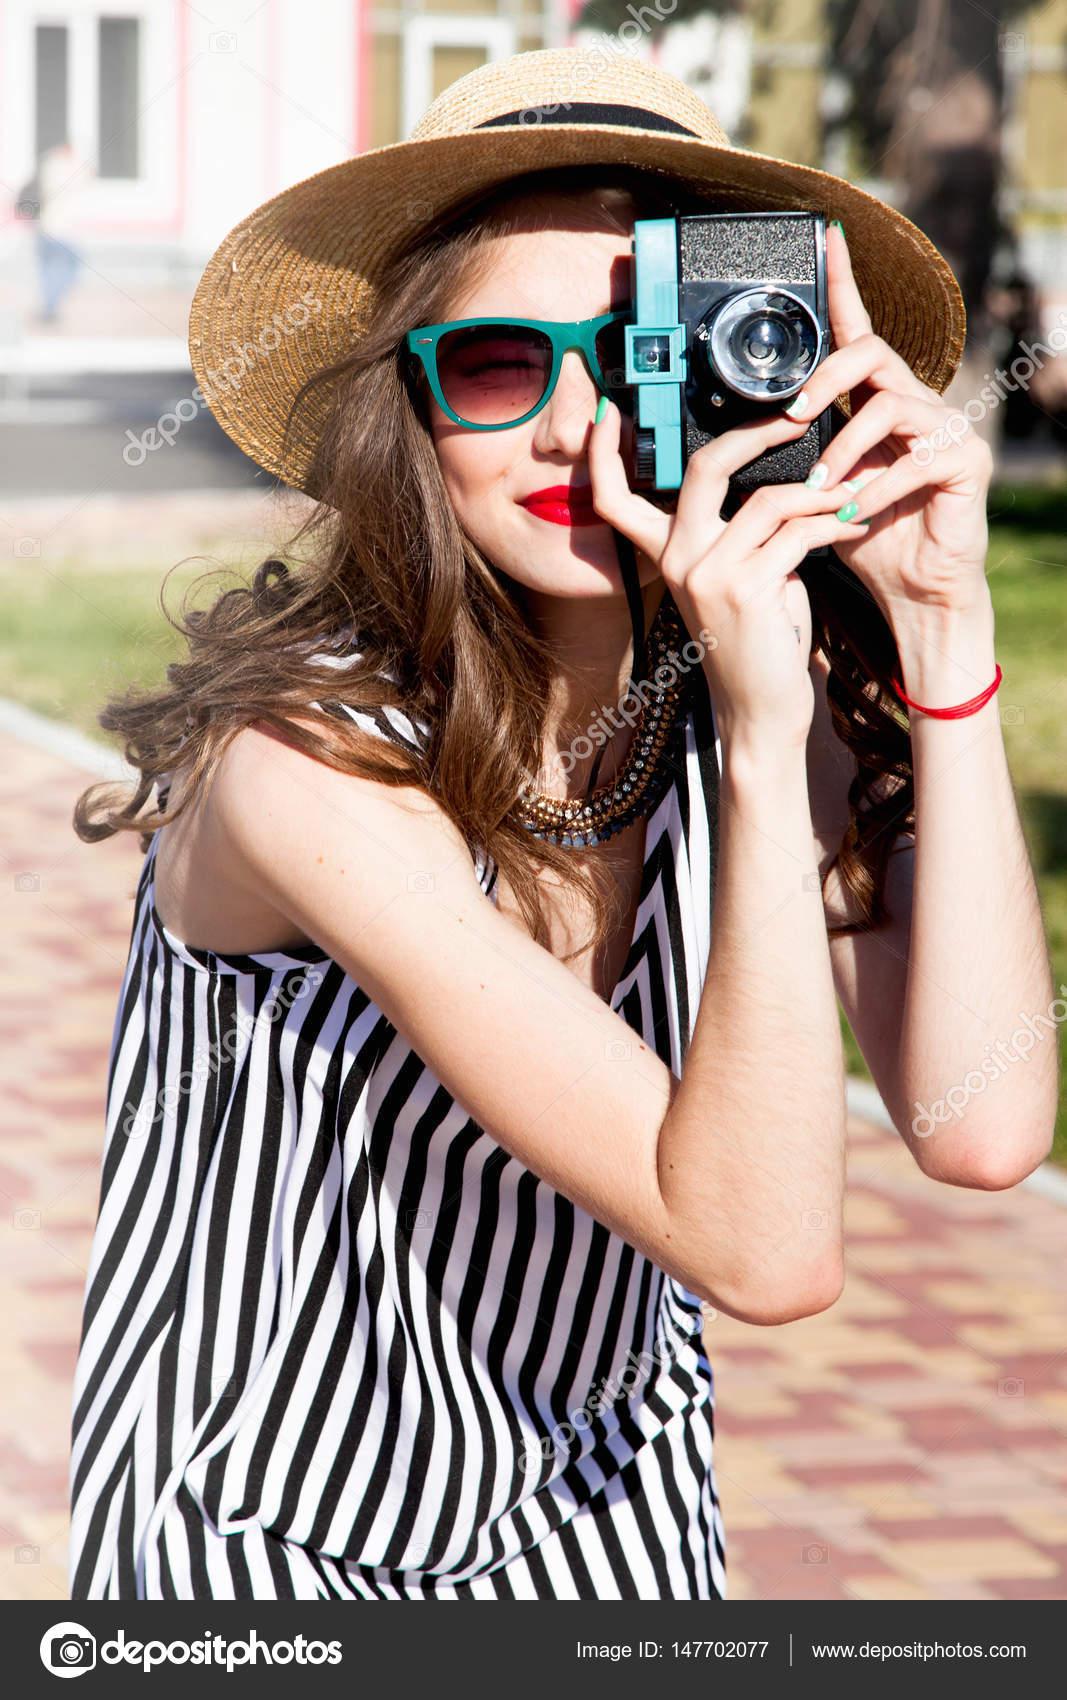 9bbe5c0afa17 Γελώντας πορτρέτο του μοντέρνο και κομψό ευτυχισμένη γυναίκα λήψη  φωτογραφίας με vintage φωτογραφική μηχανή στην ηλιόλουστη μέρα — Εικόνα από  Diana. ...